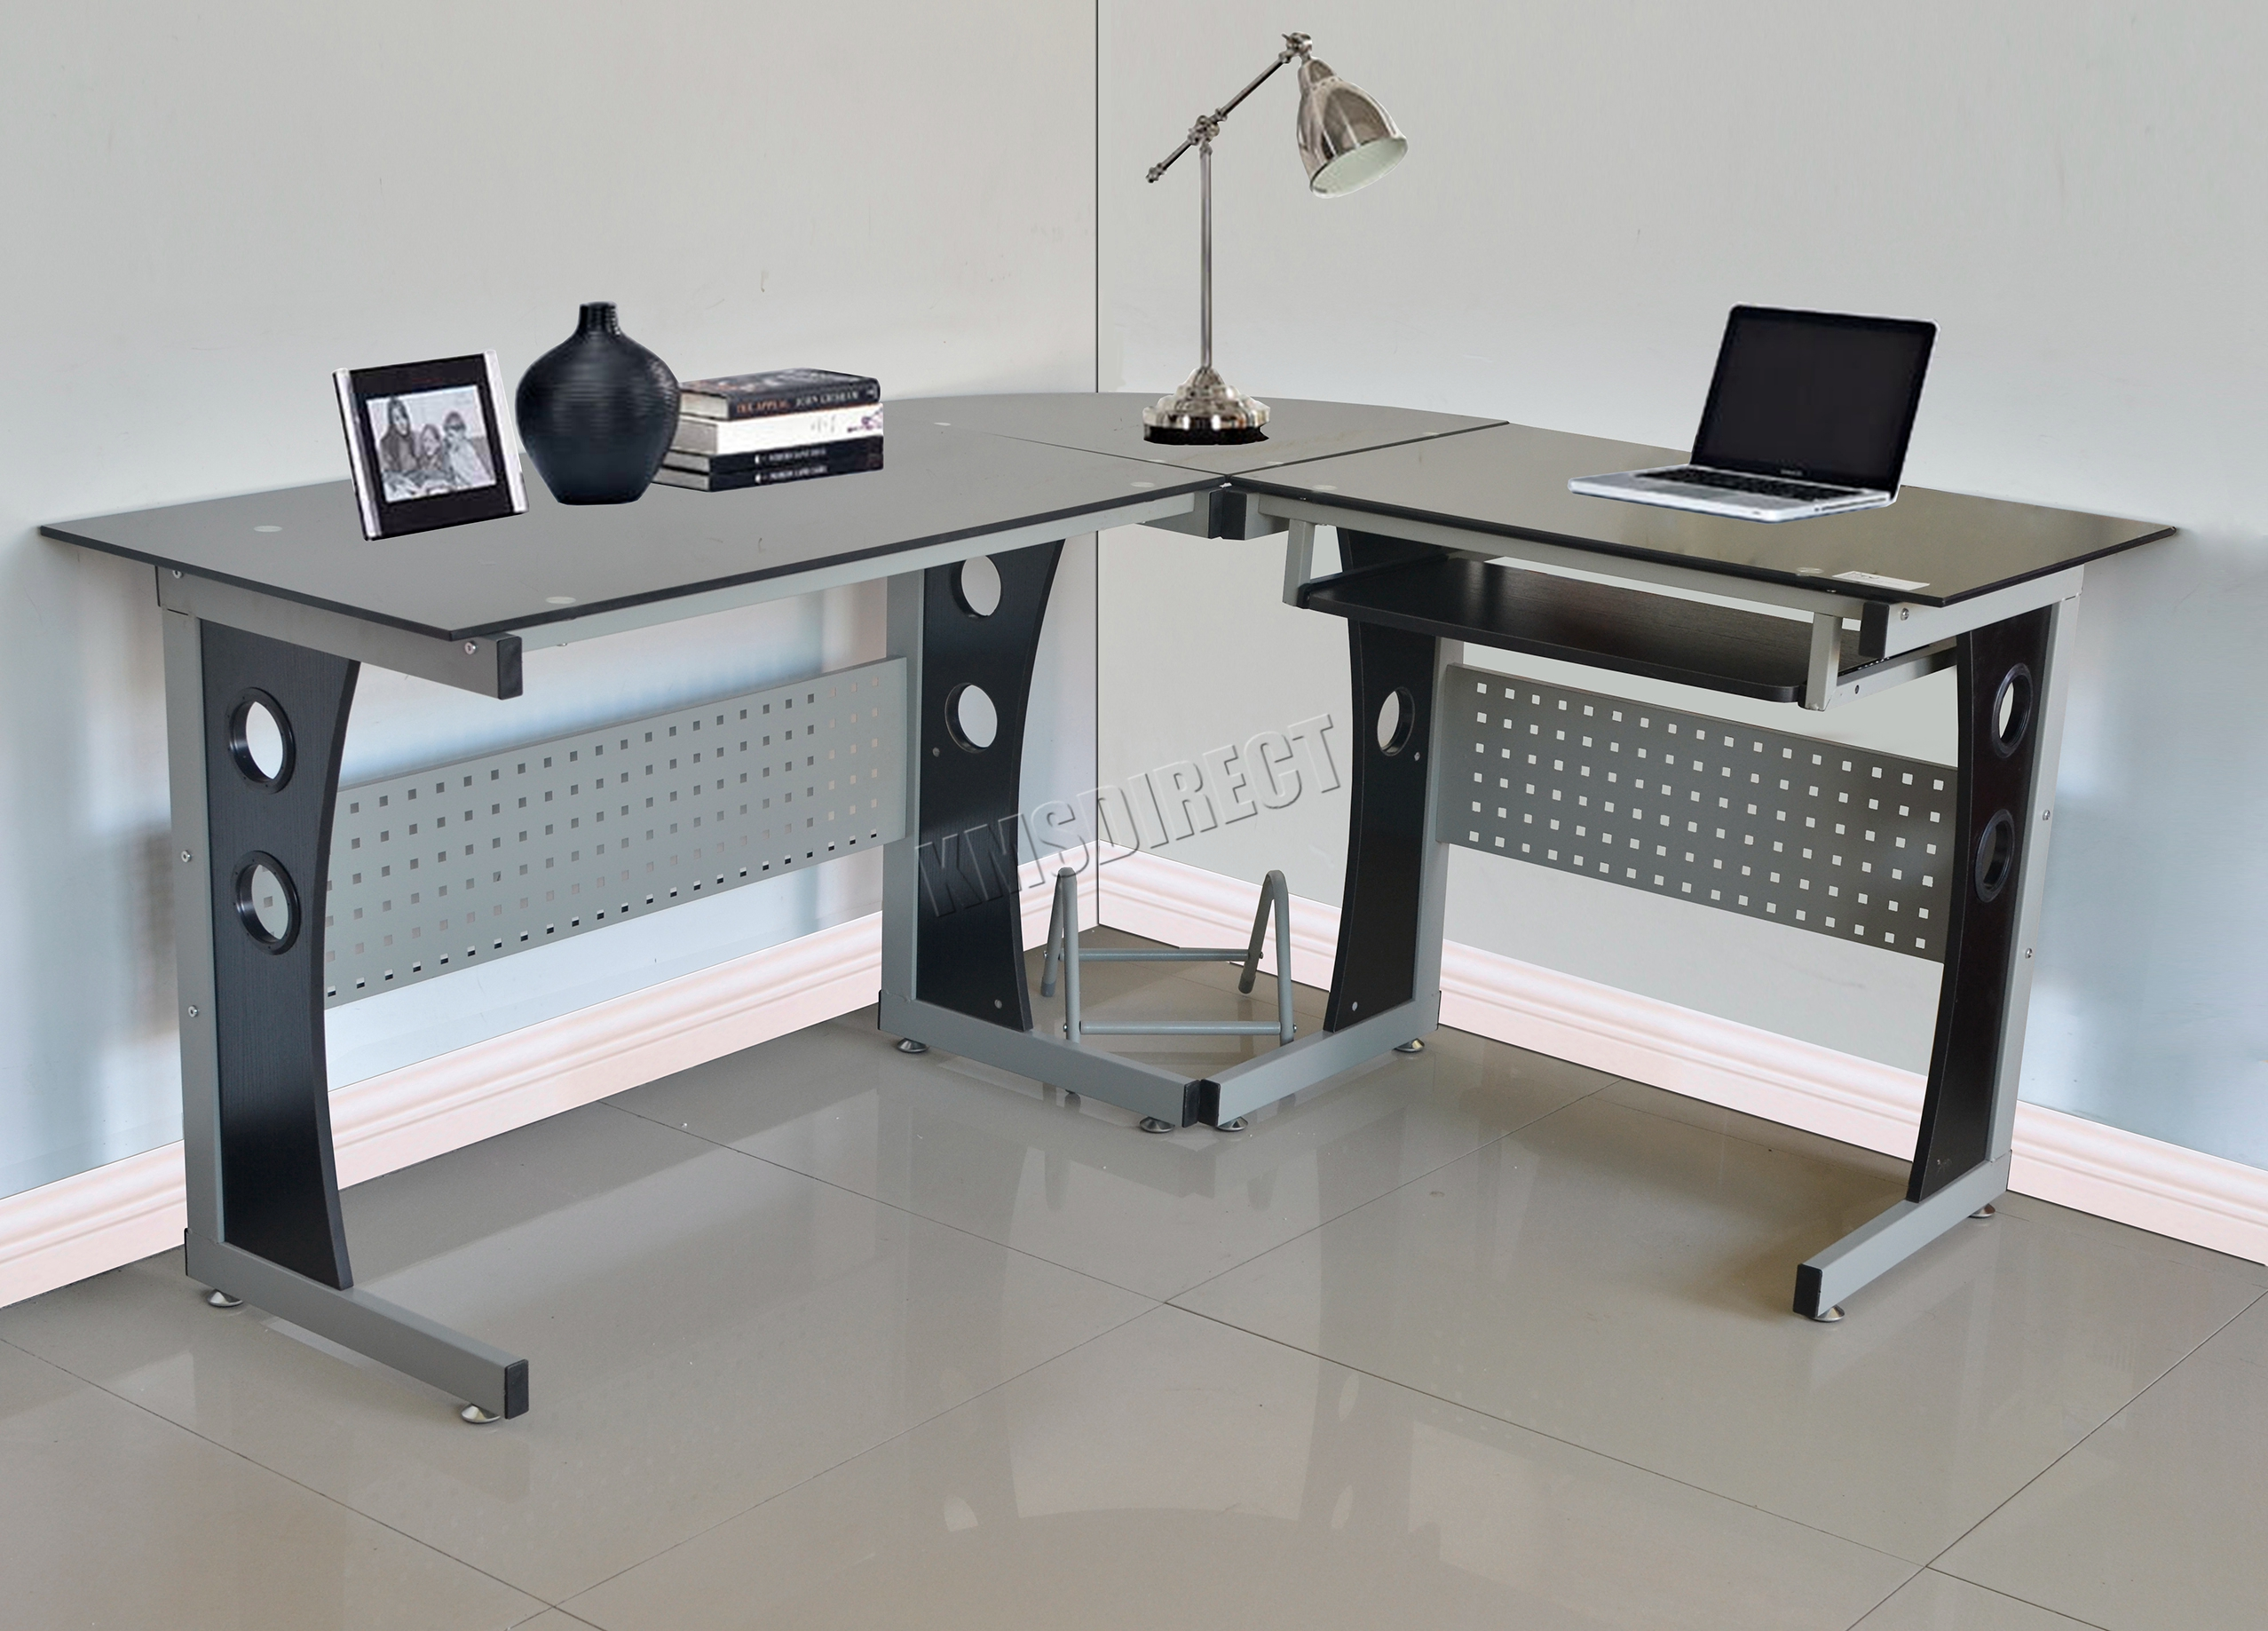 Sentinel Westwood L Shaped Corner Computer Desk Pc Table Home Office Study Cd11 Black